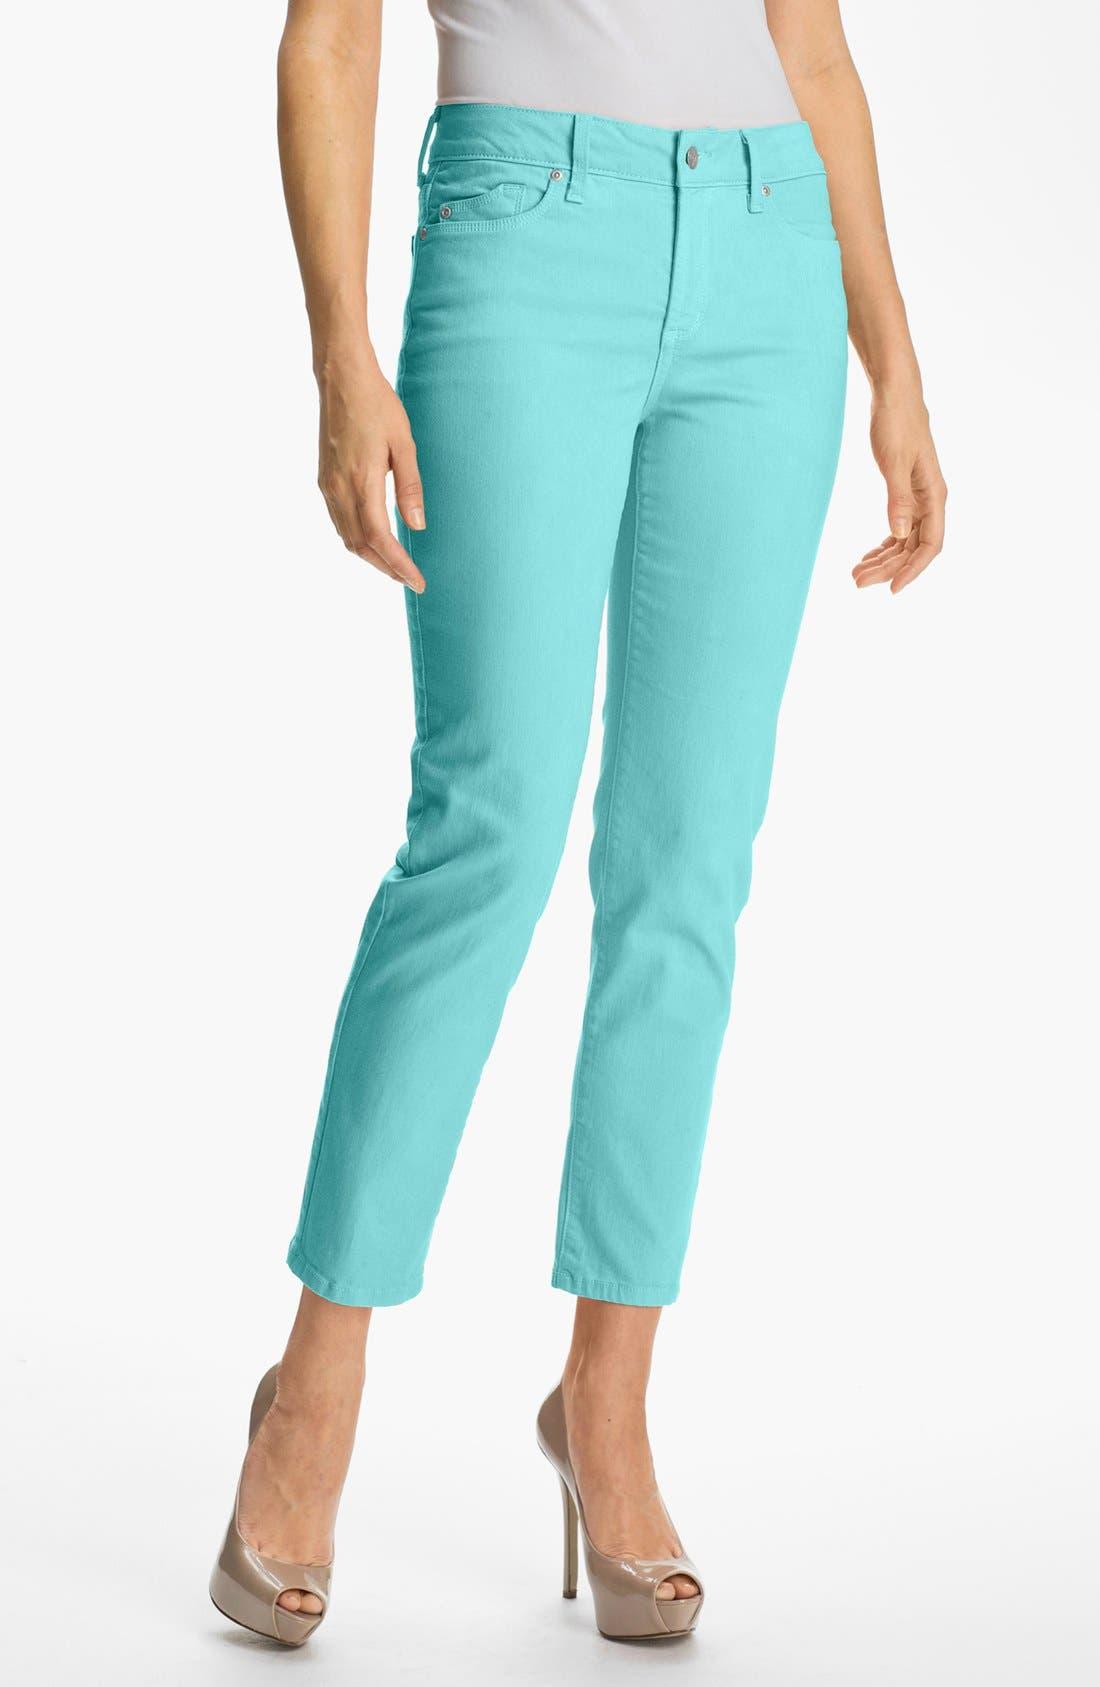 Main Image - NYDJ 'Alisha' Colored Stretch Ankle Skinny Jeans